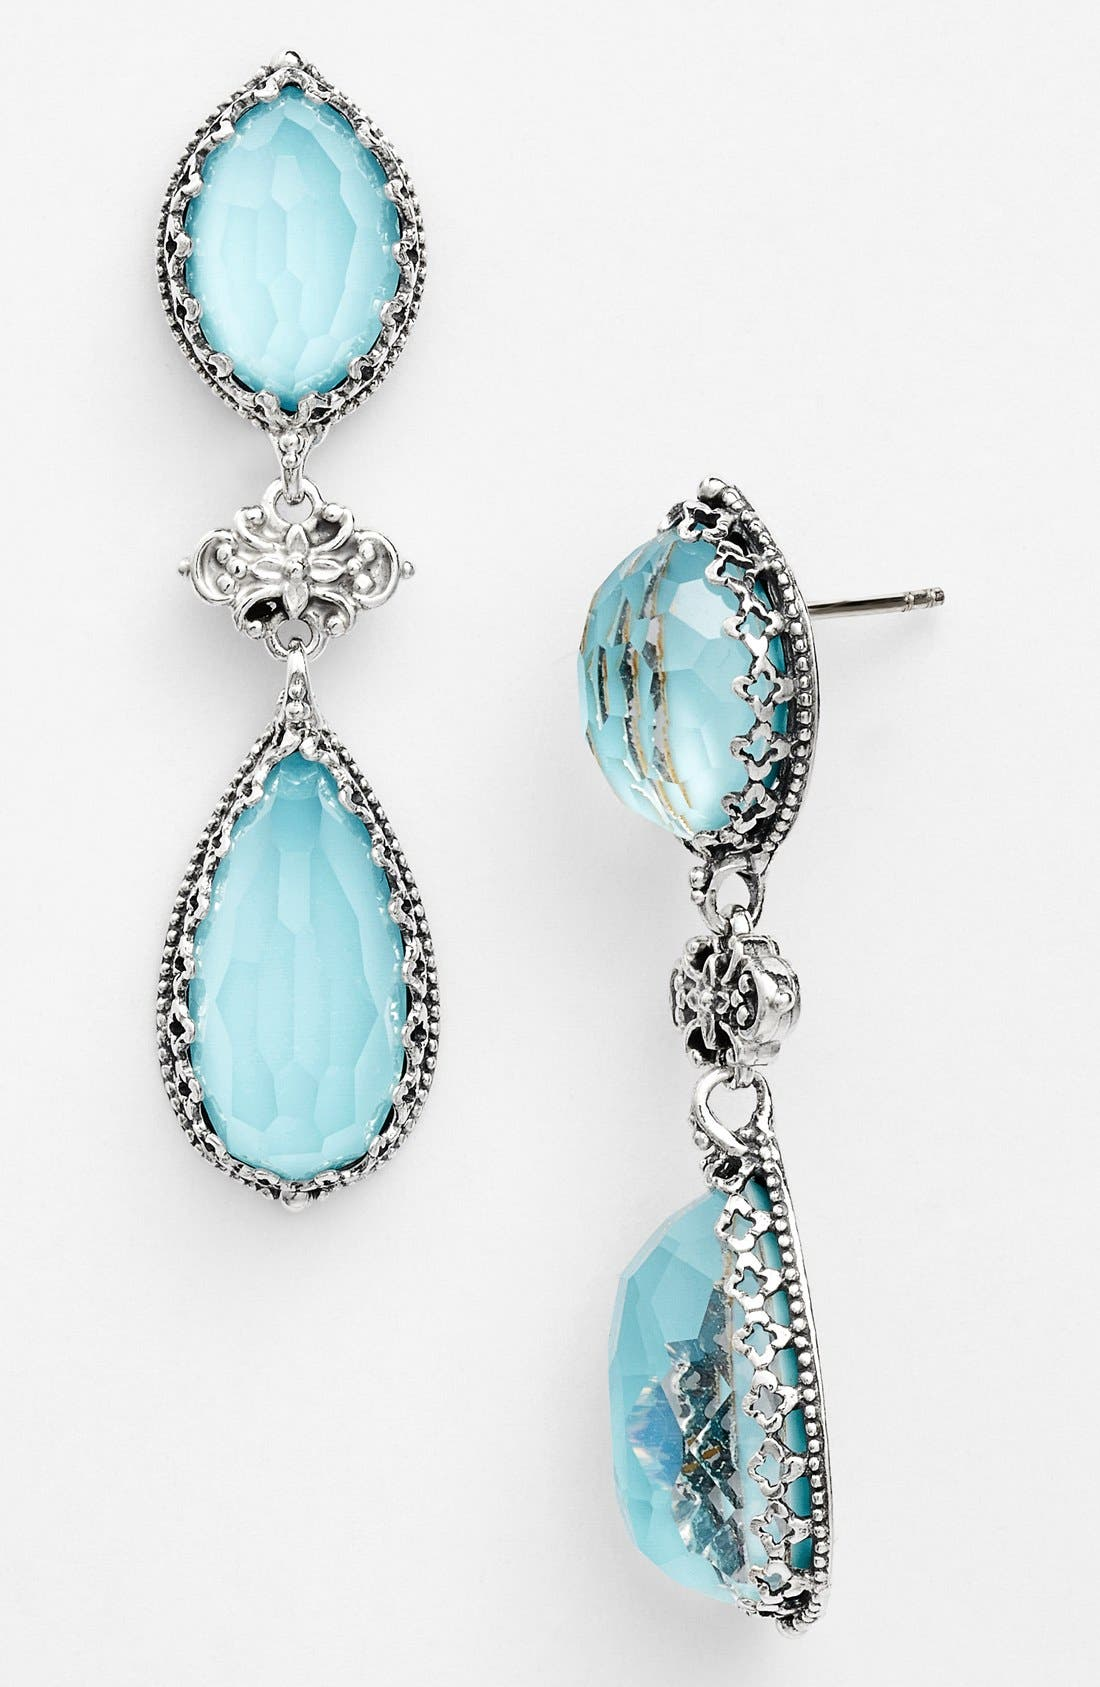 'Aegean' Drop Earrings,                             Main thumbnail 1, color,                             Silver/ Turquoise